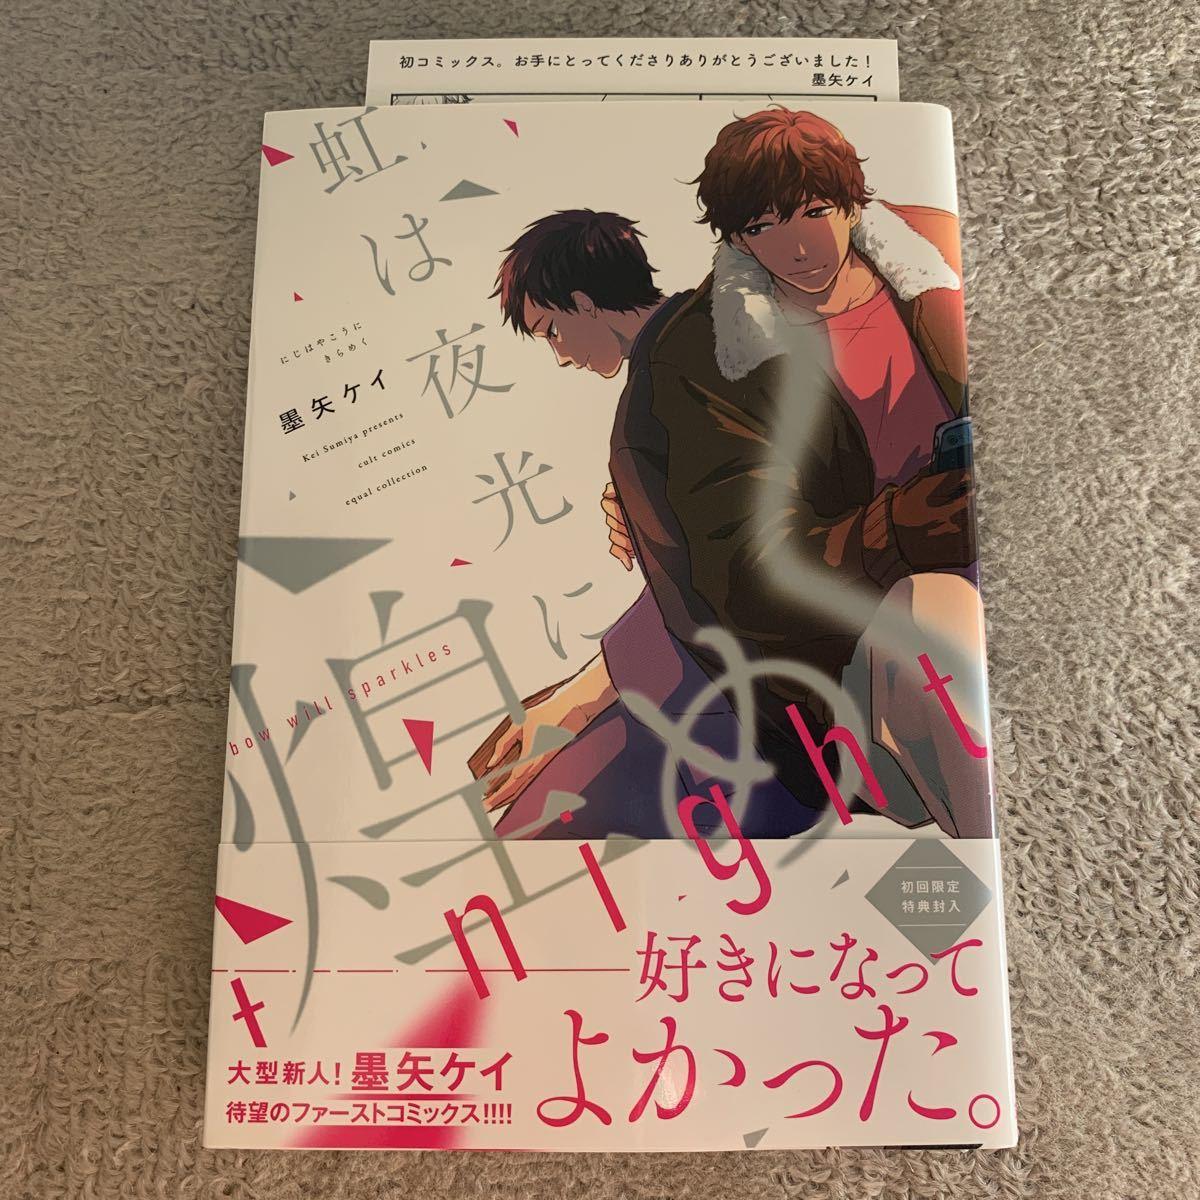 BLコミック 虹は夜光に煌く 墨矢ケイ 出版社ペーパー付き